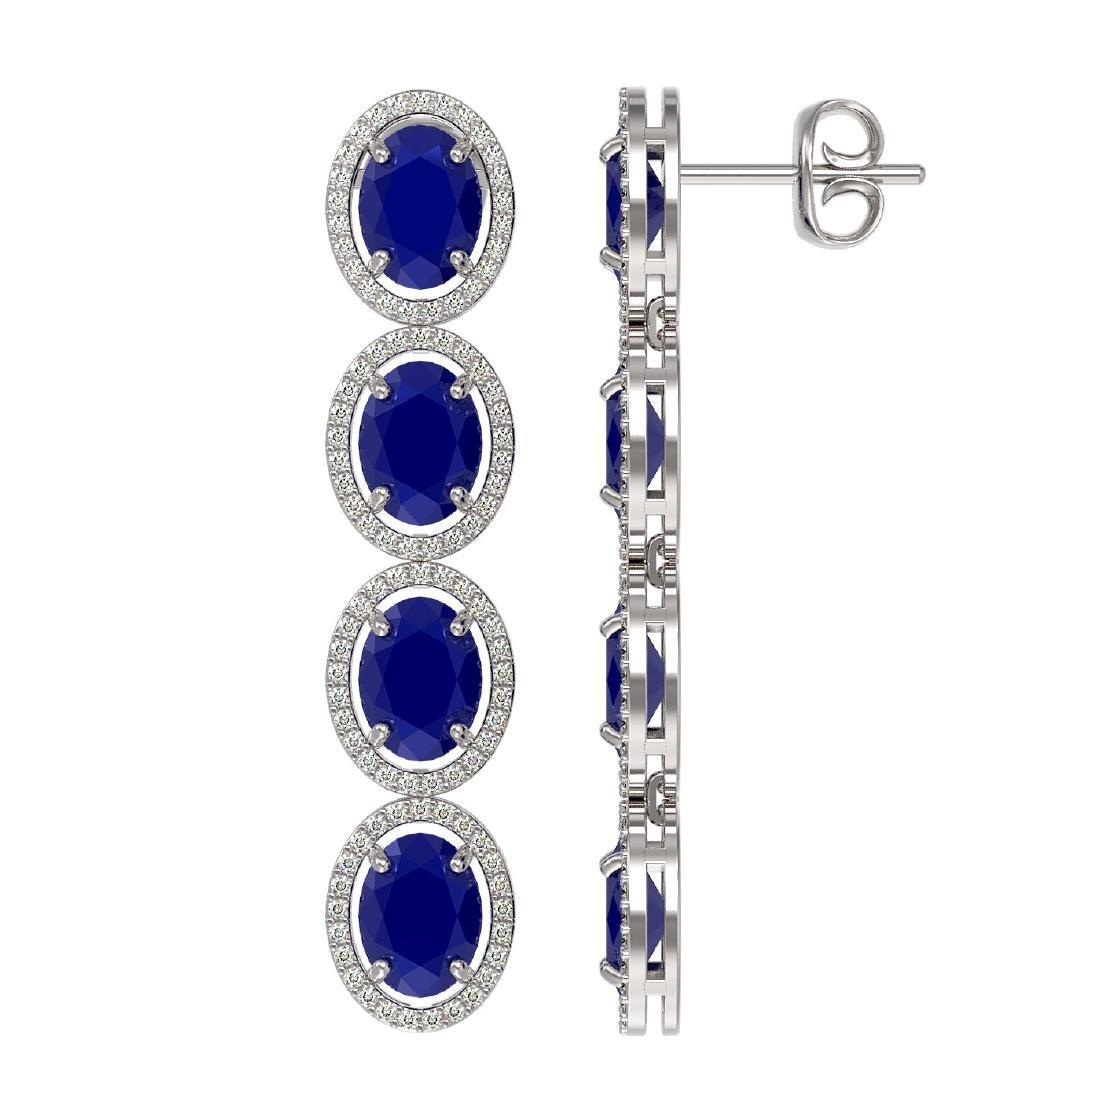 15.68 CTW Sapphire & Diamond Halo Earrings 10K White - 2